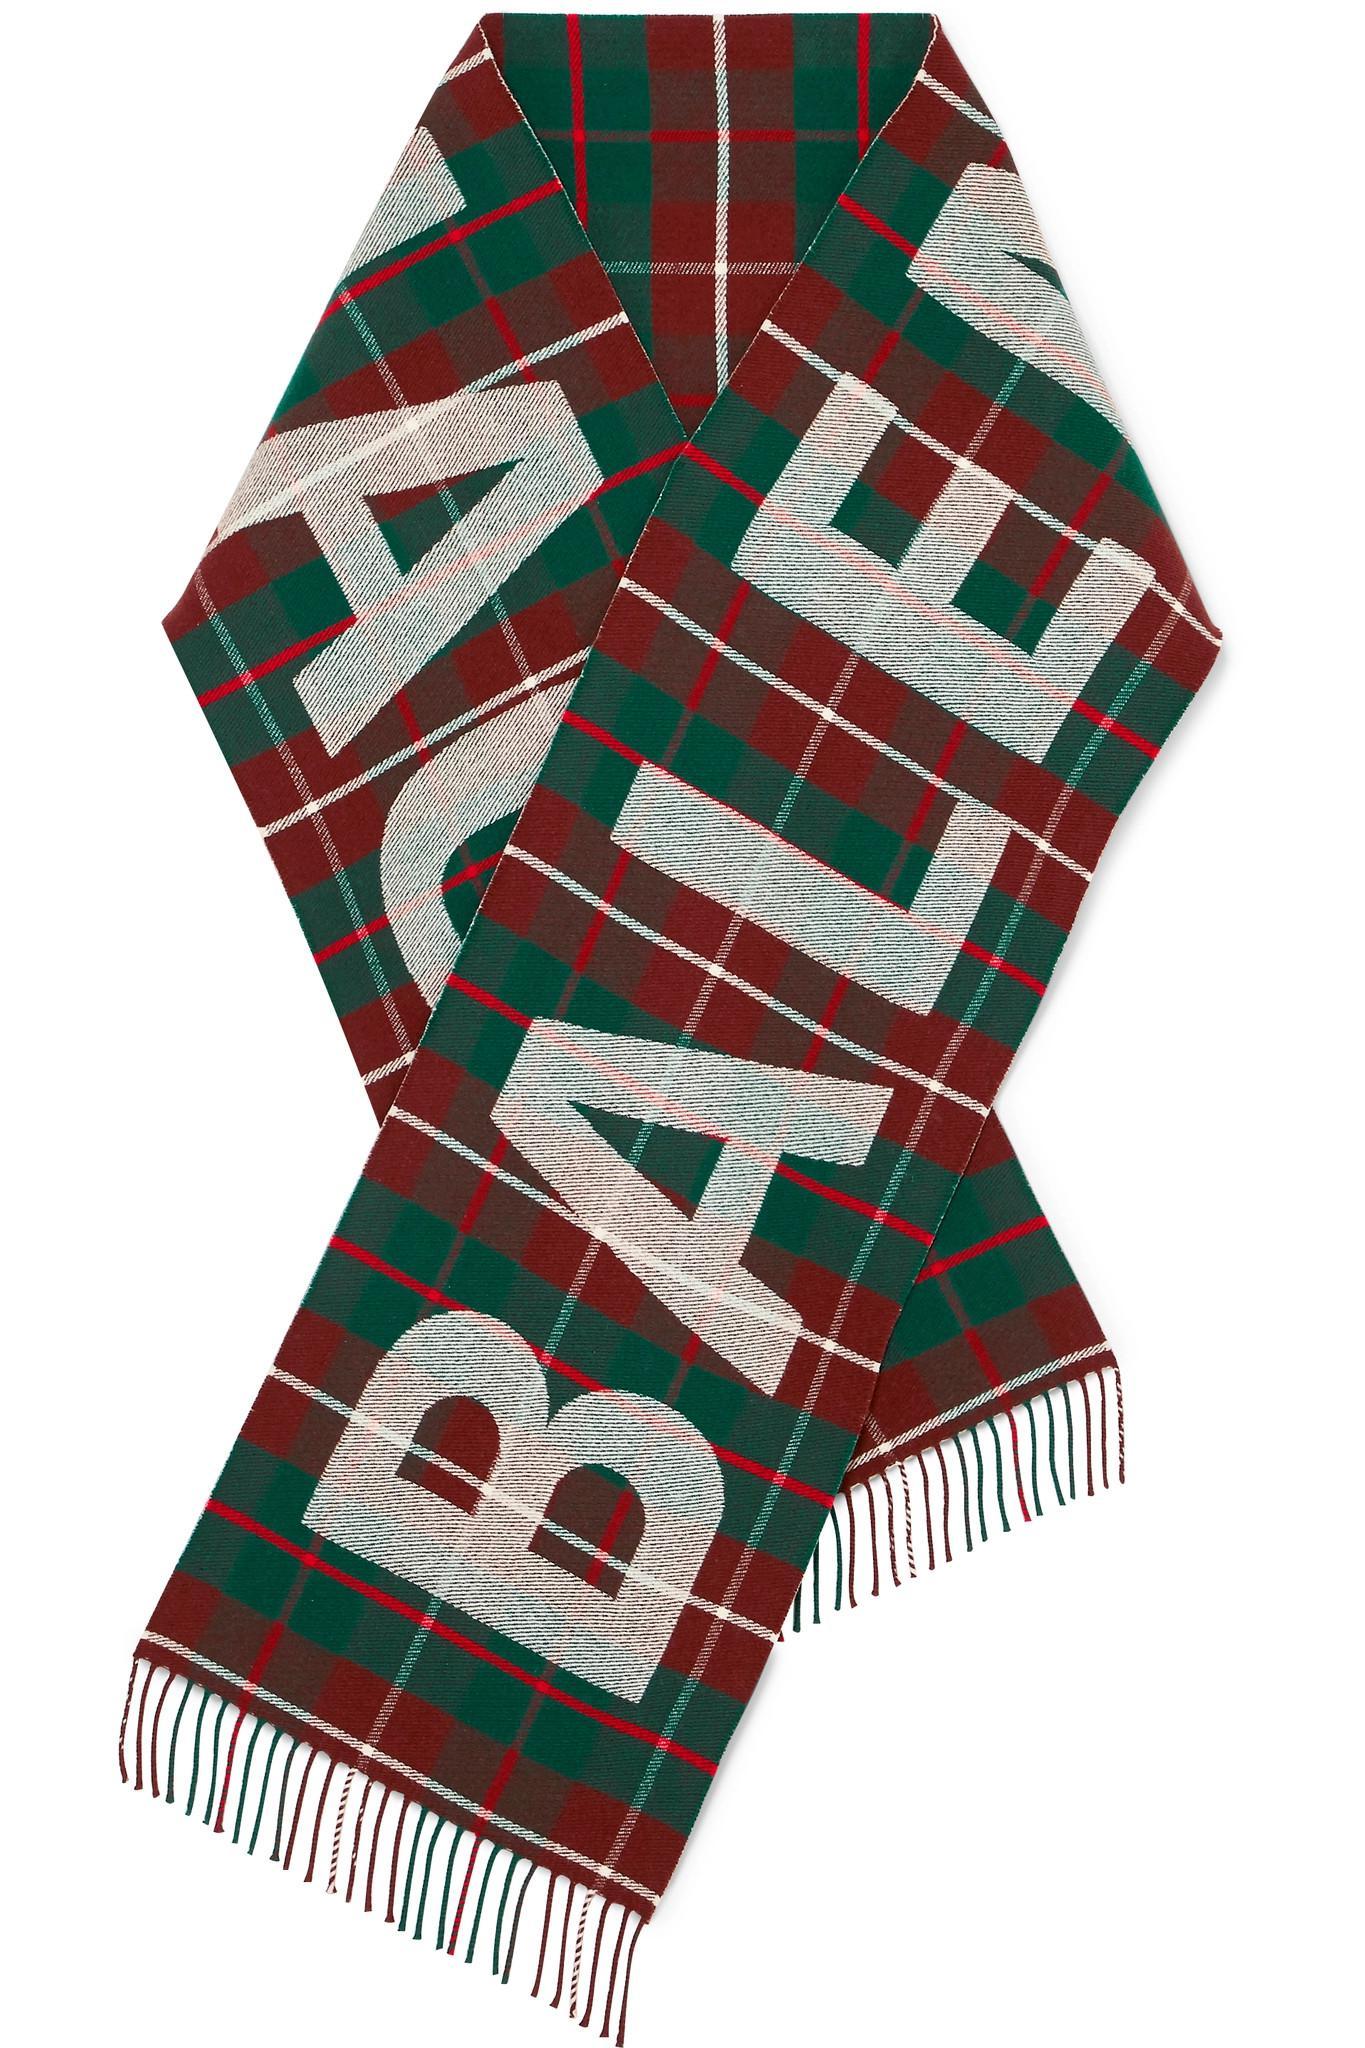 d7dfe830841 Lyst - Balenciaga Tartan Intarsia Wool Scarf in Green